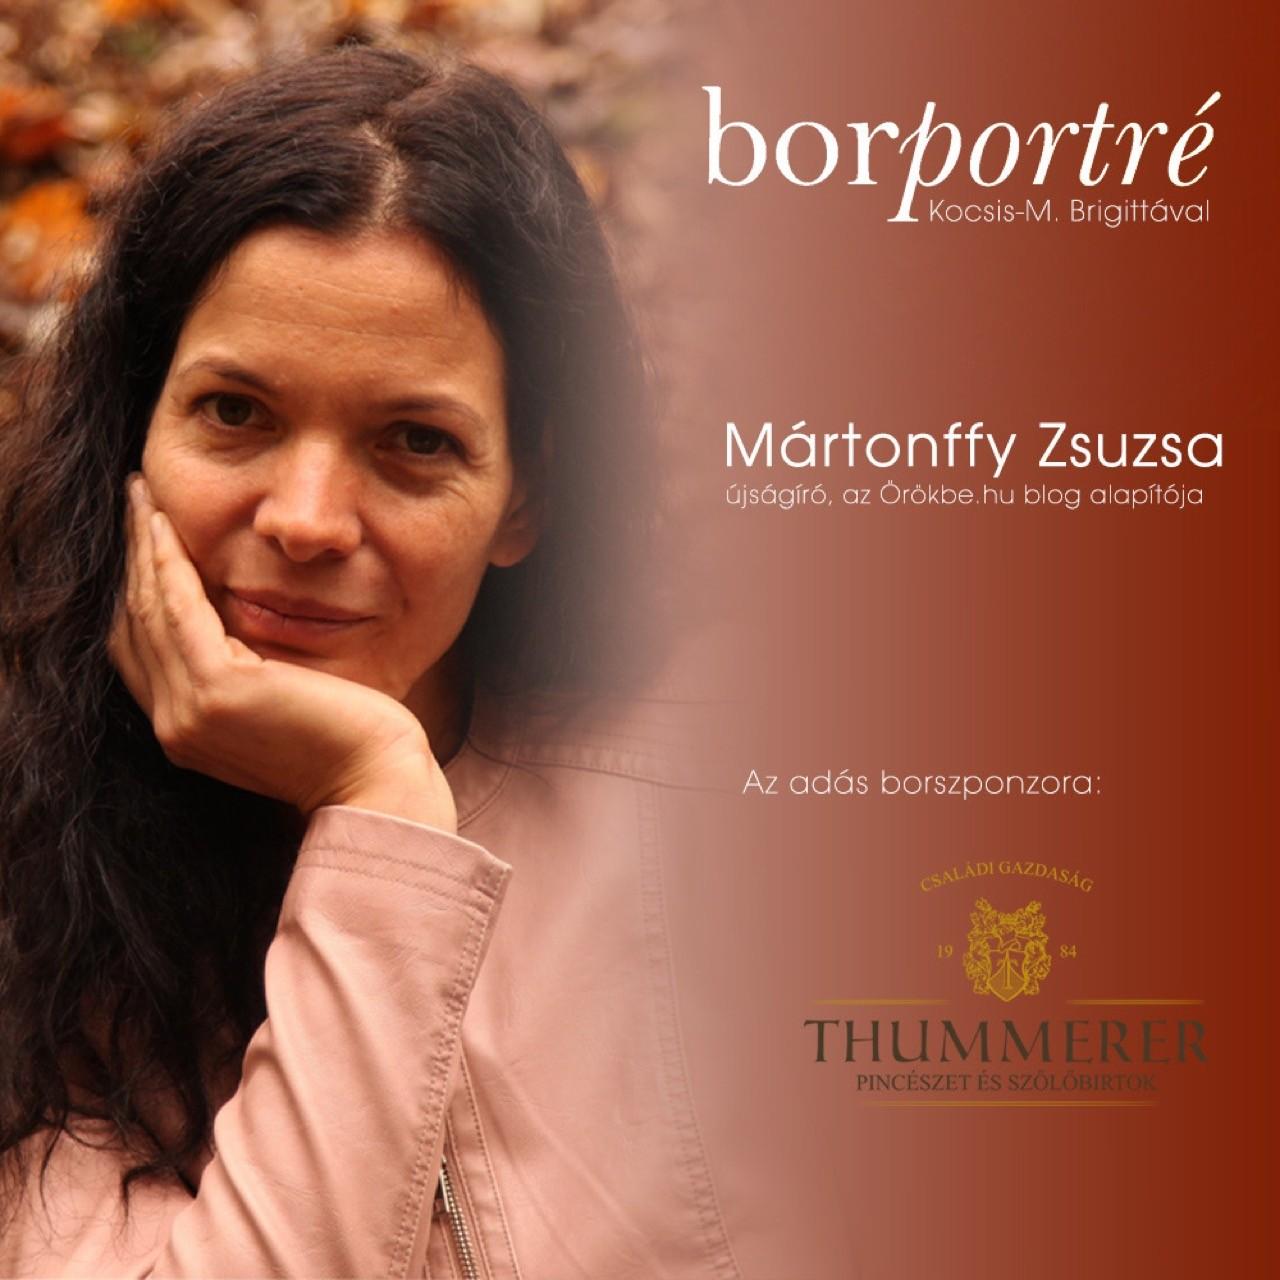 borportre_2020_11_11_martonffy_zsuzsa_orokbefogadas_thummerer_kocka